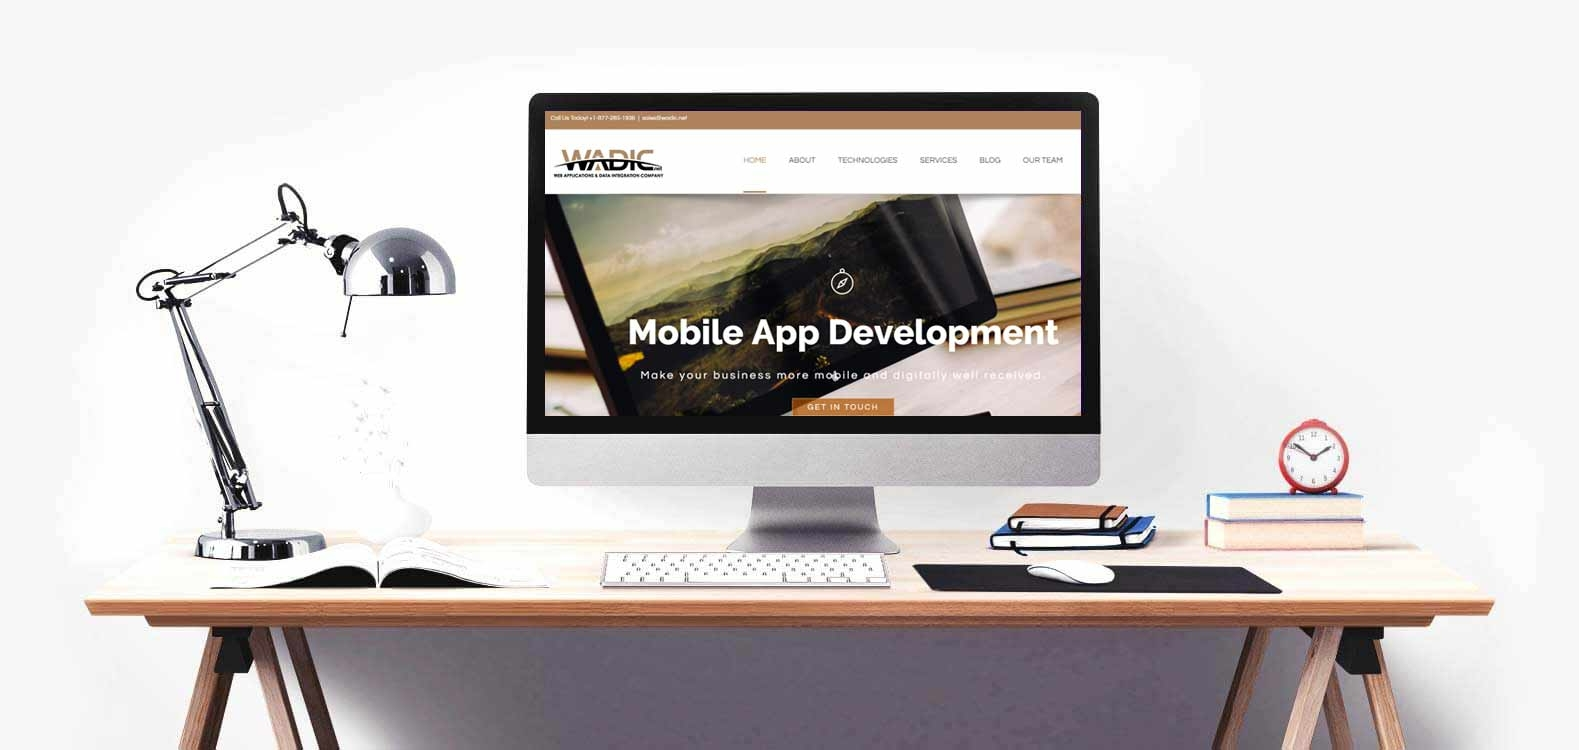 WADIC - Web Application & Data Integration Company (@wadic) Cover Image